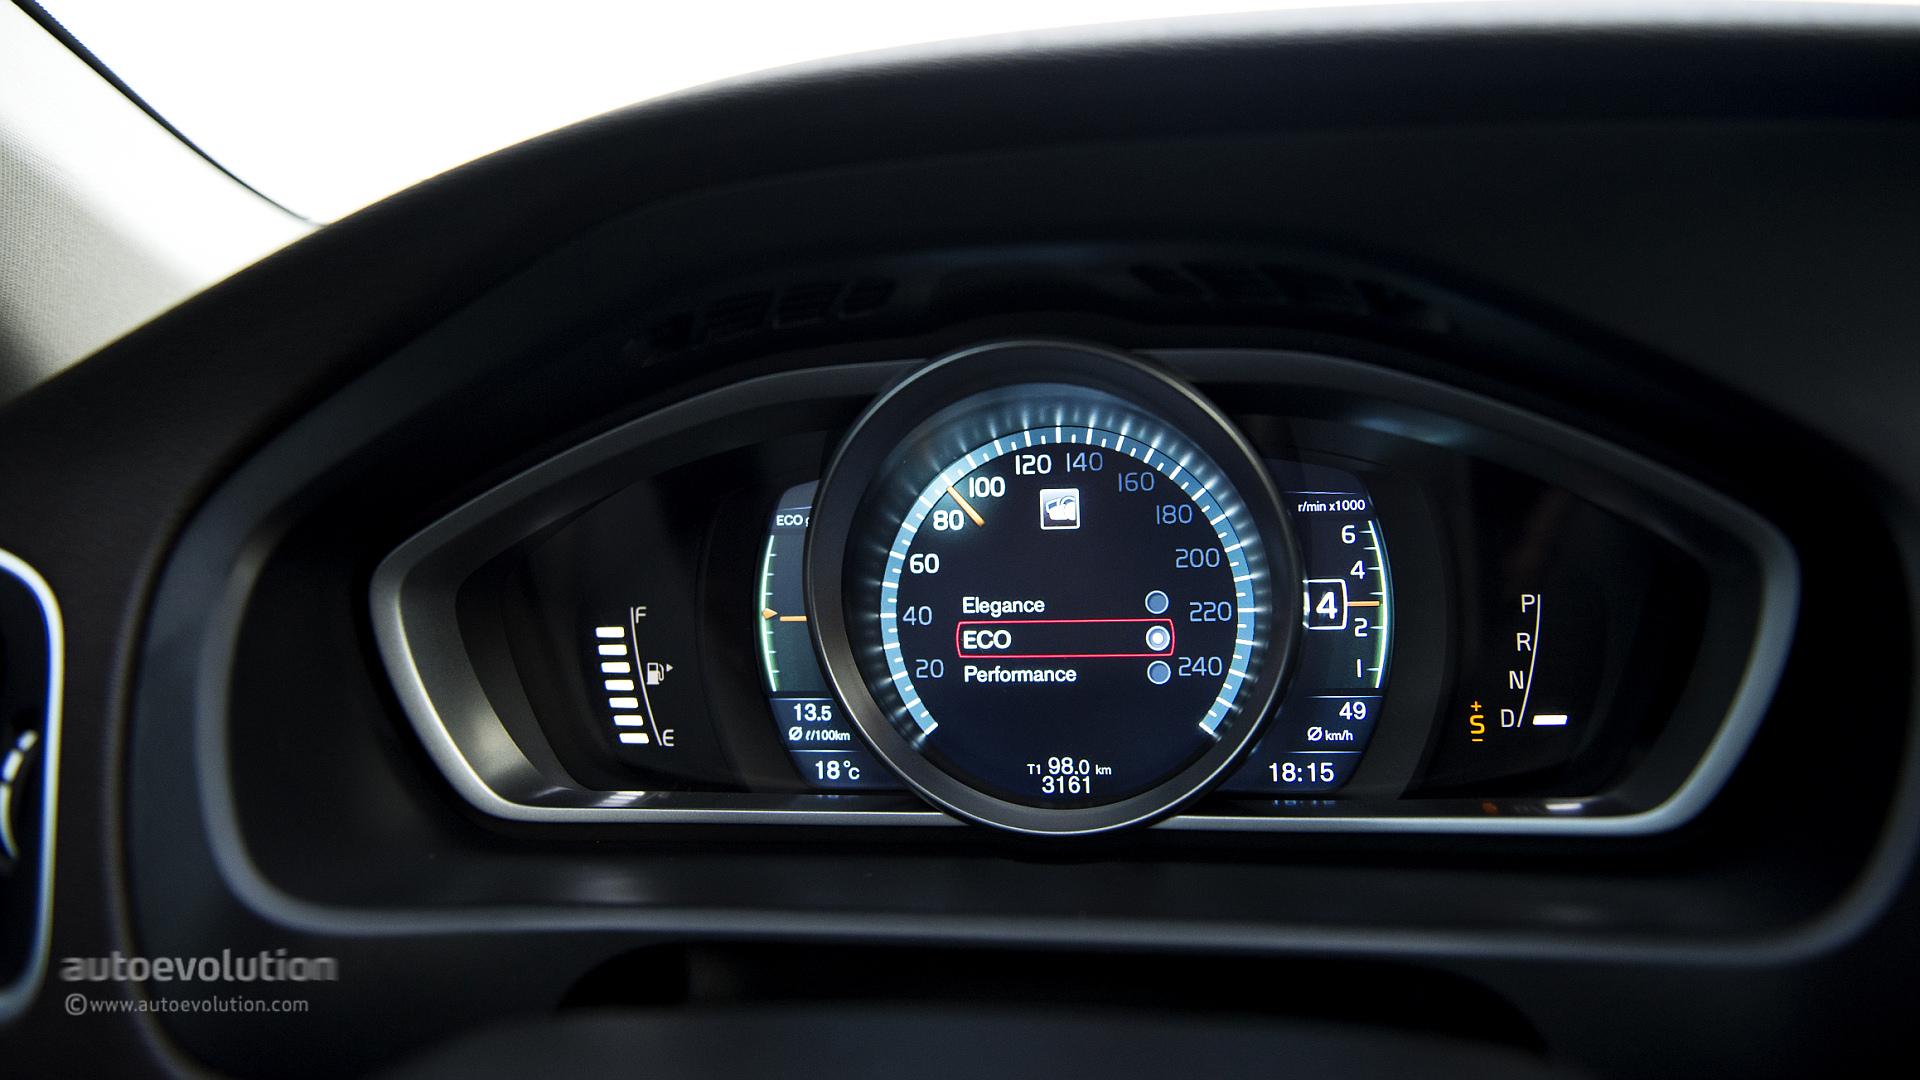 Car Dash Wallpaper Mercedes Gla 220 Cdi Vs Volvo V40 Cross Country D4 The